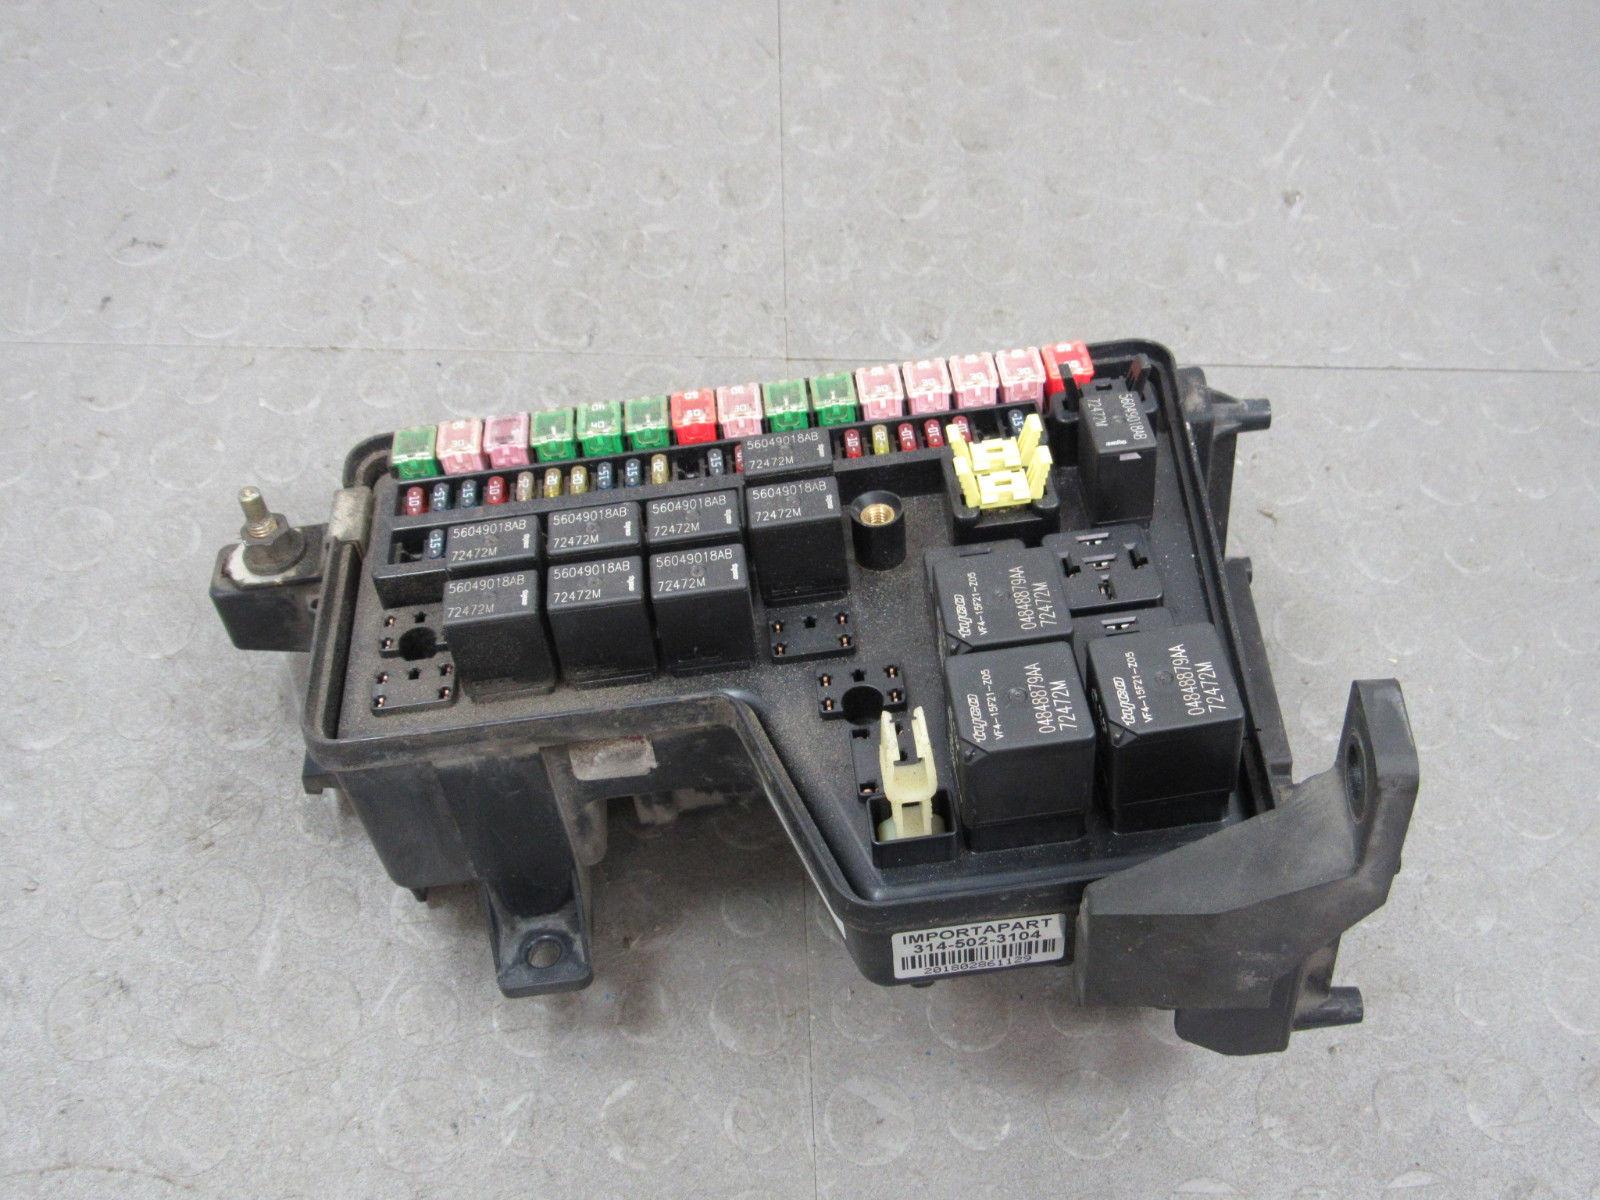 hight resolution of 02 03 dodge ram truck integrated power module fuse box block 1996 dodge dakota fuse box